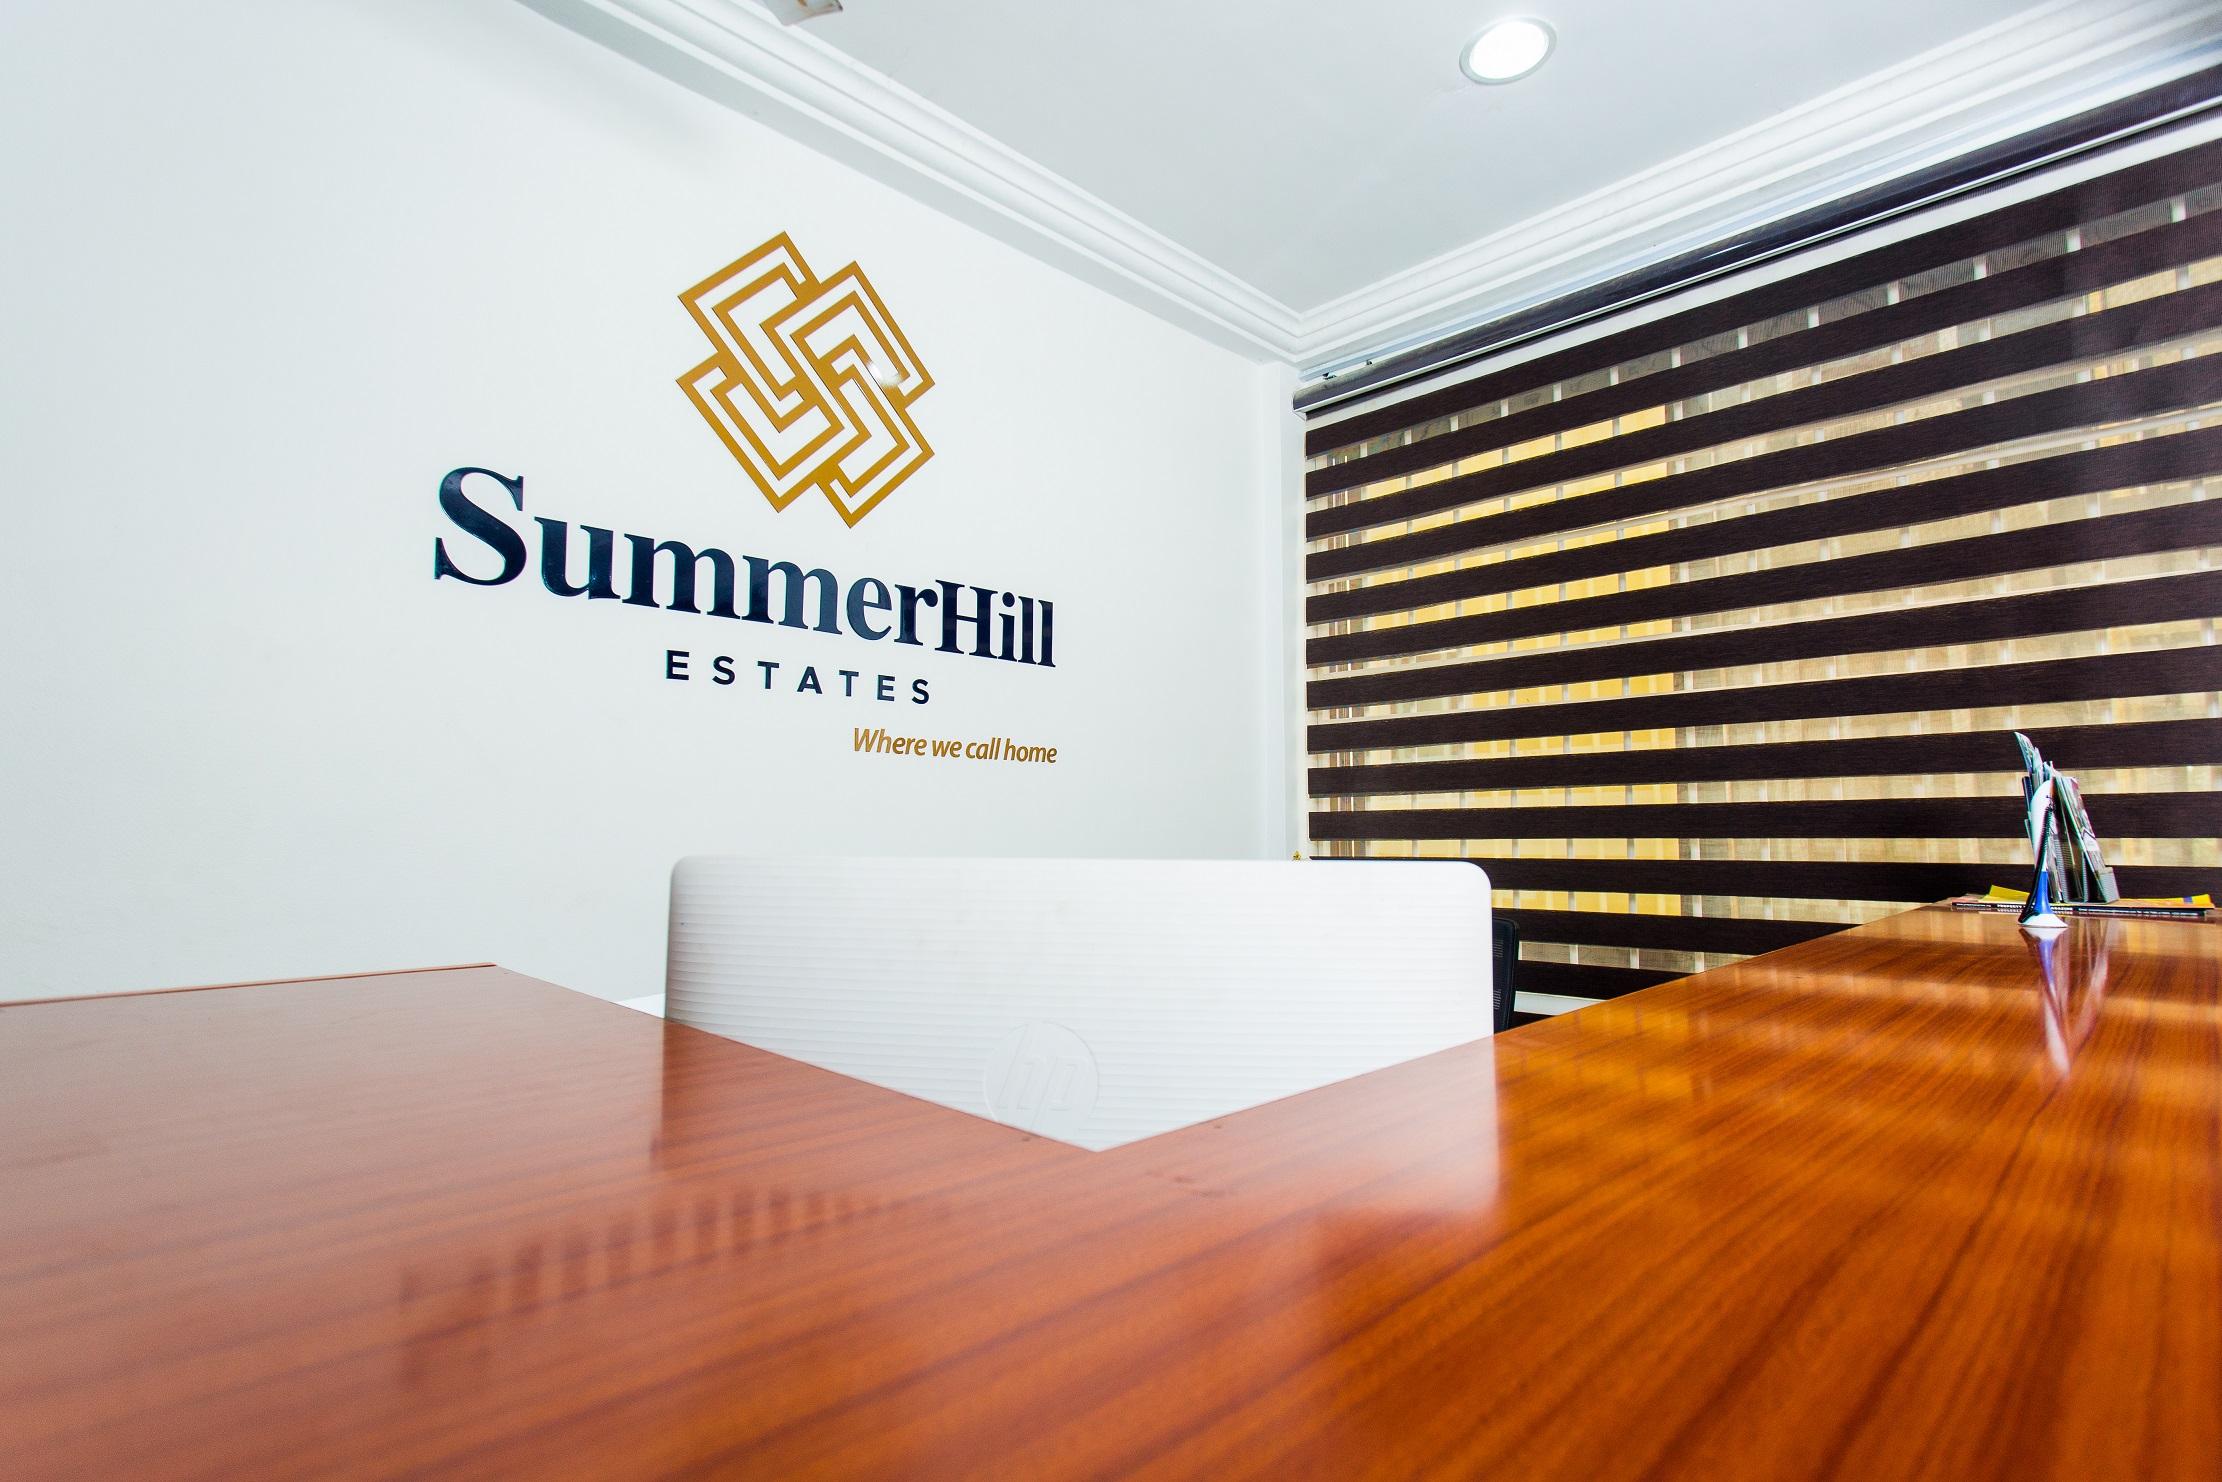 Nananom Group of Companies Launches SummerHill Estates